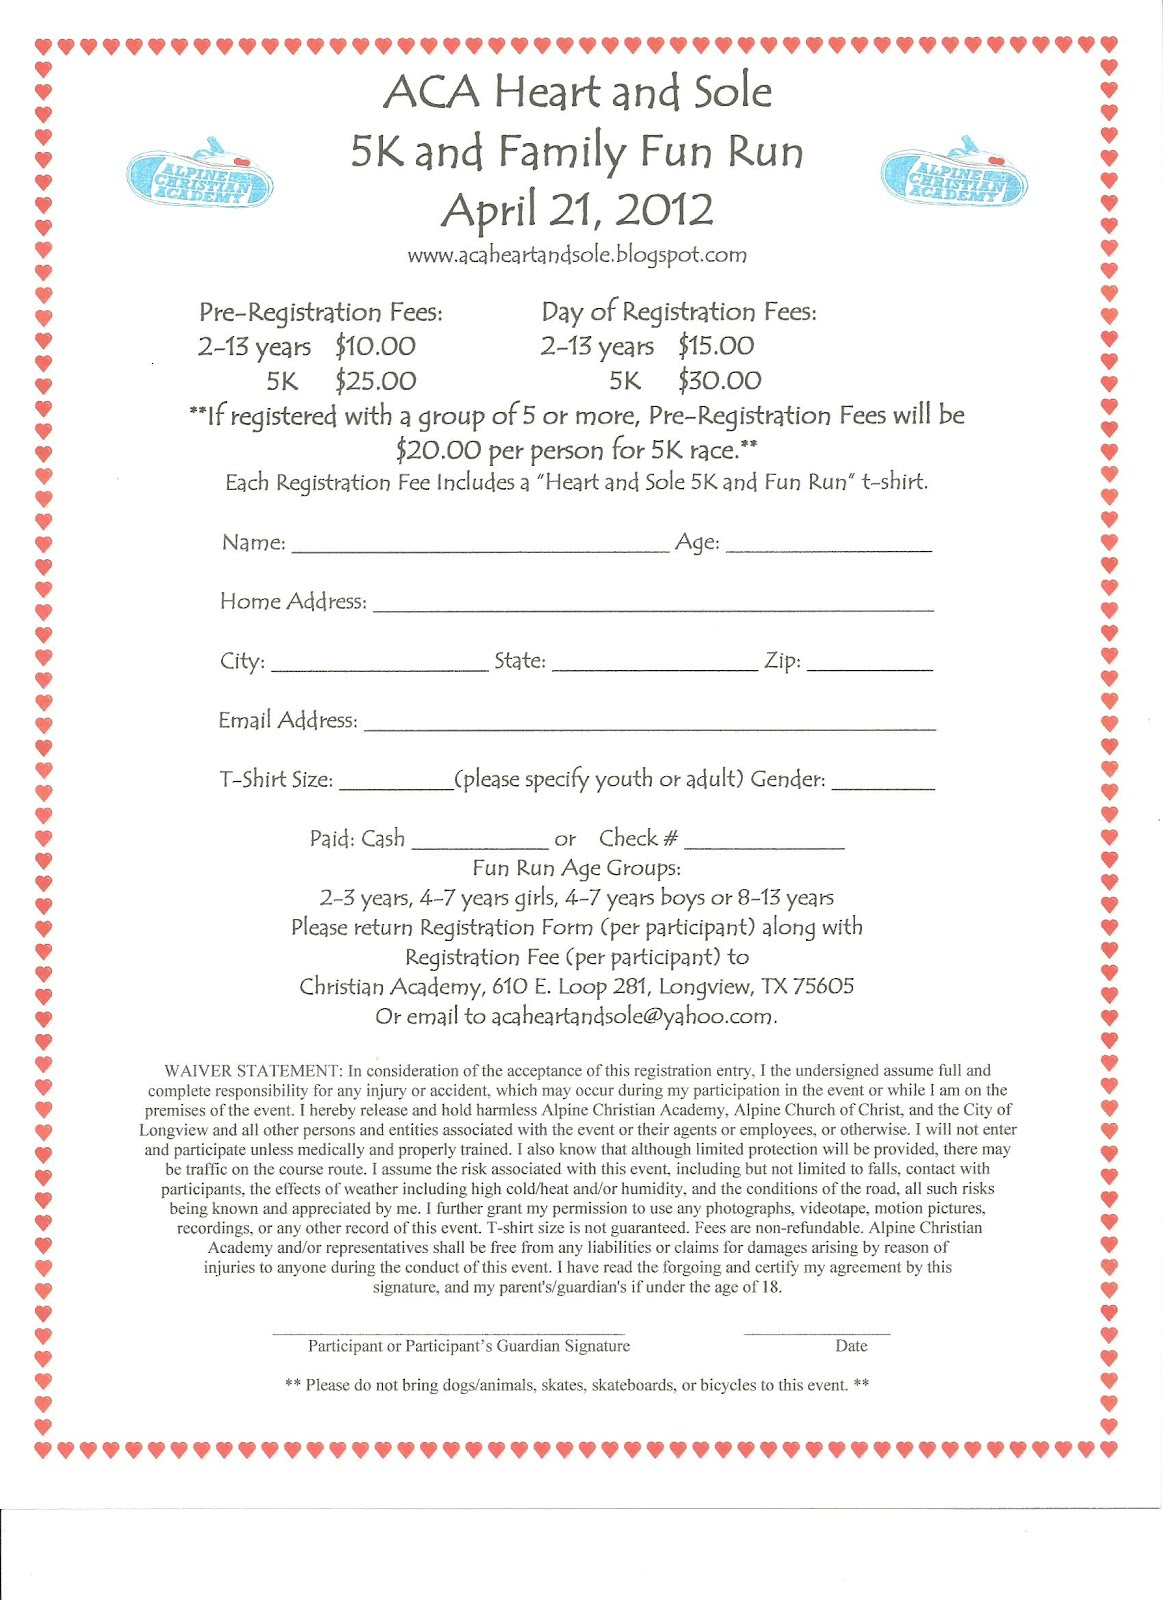 Registration open for casnr 5k fun run | unl parent email.